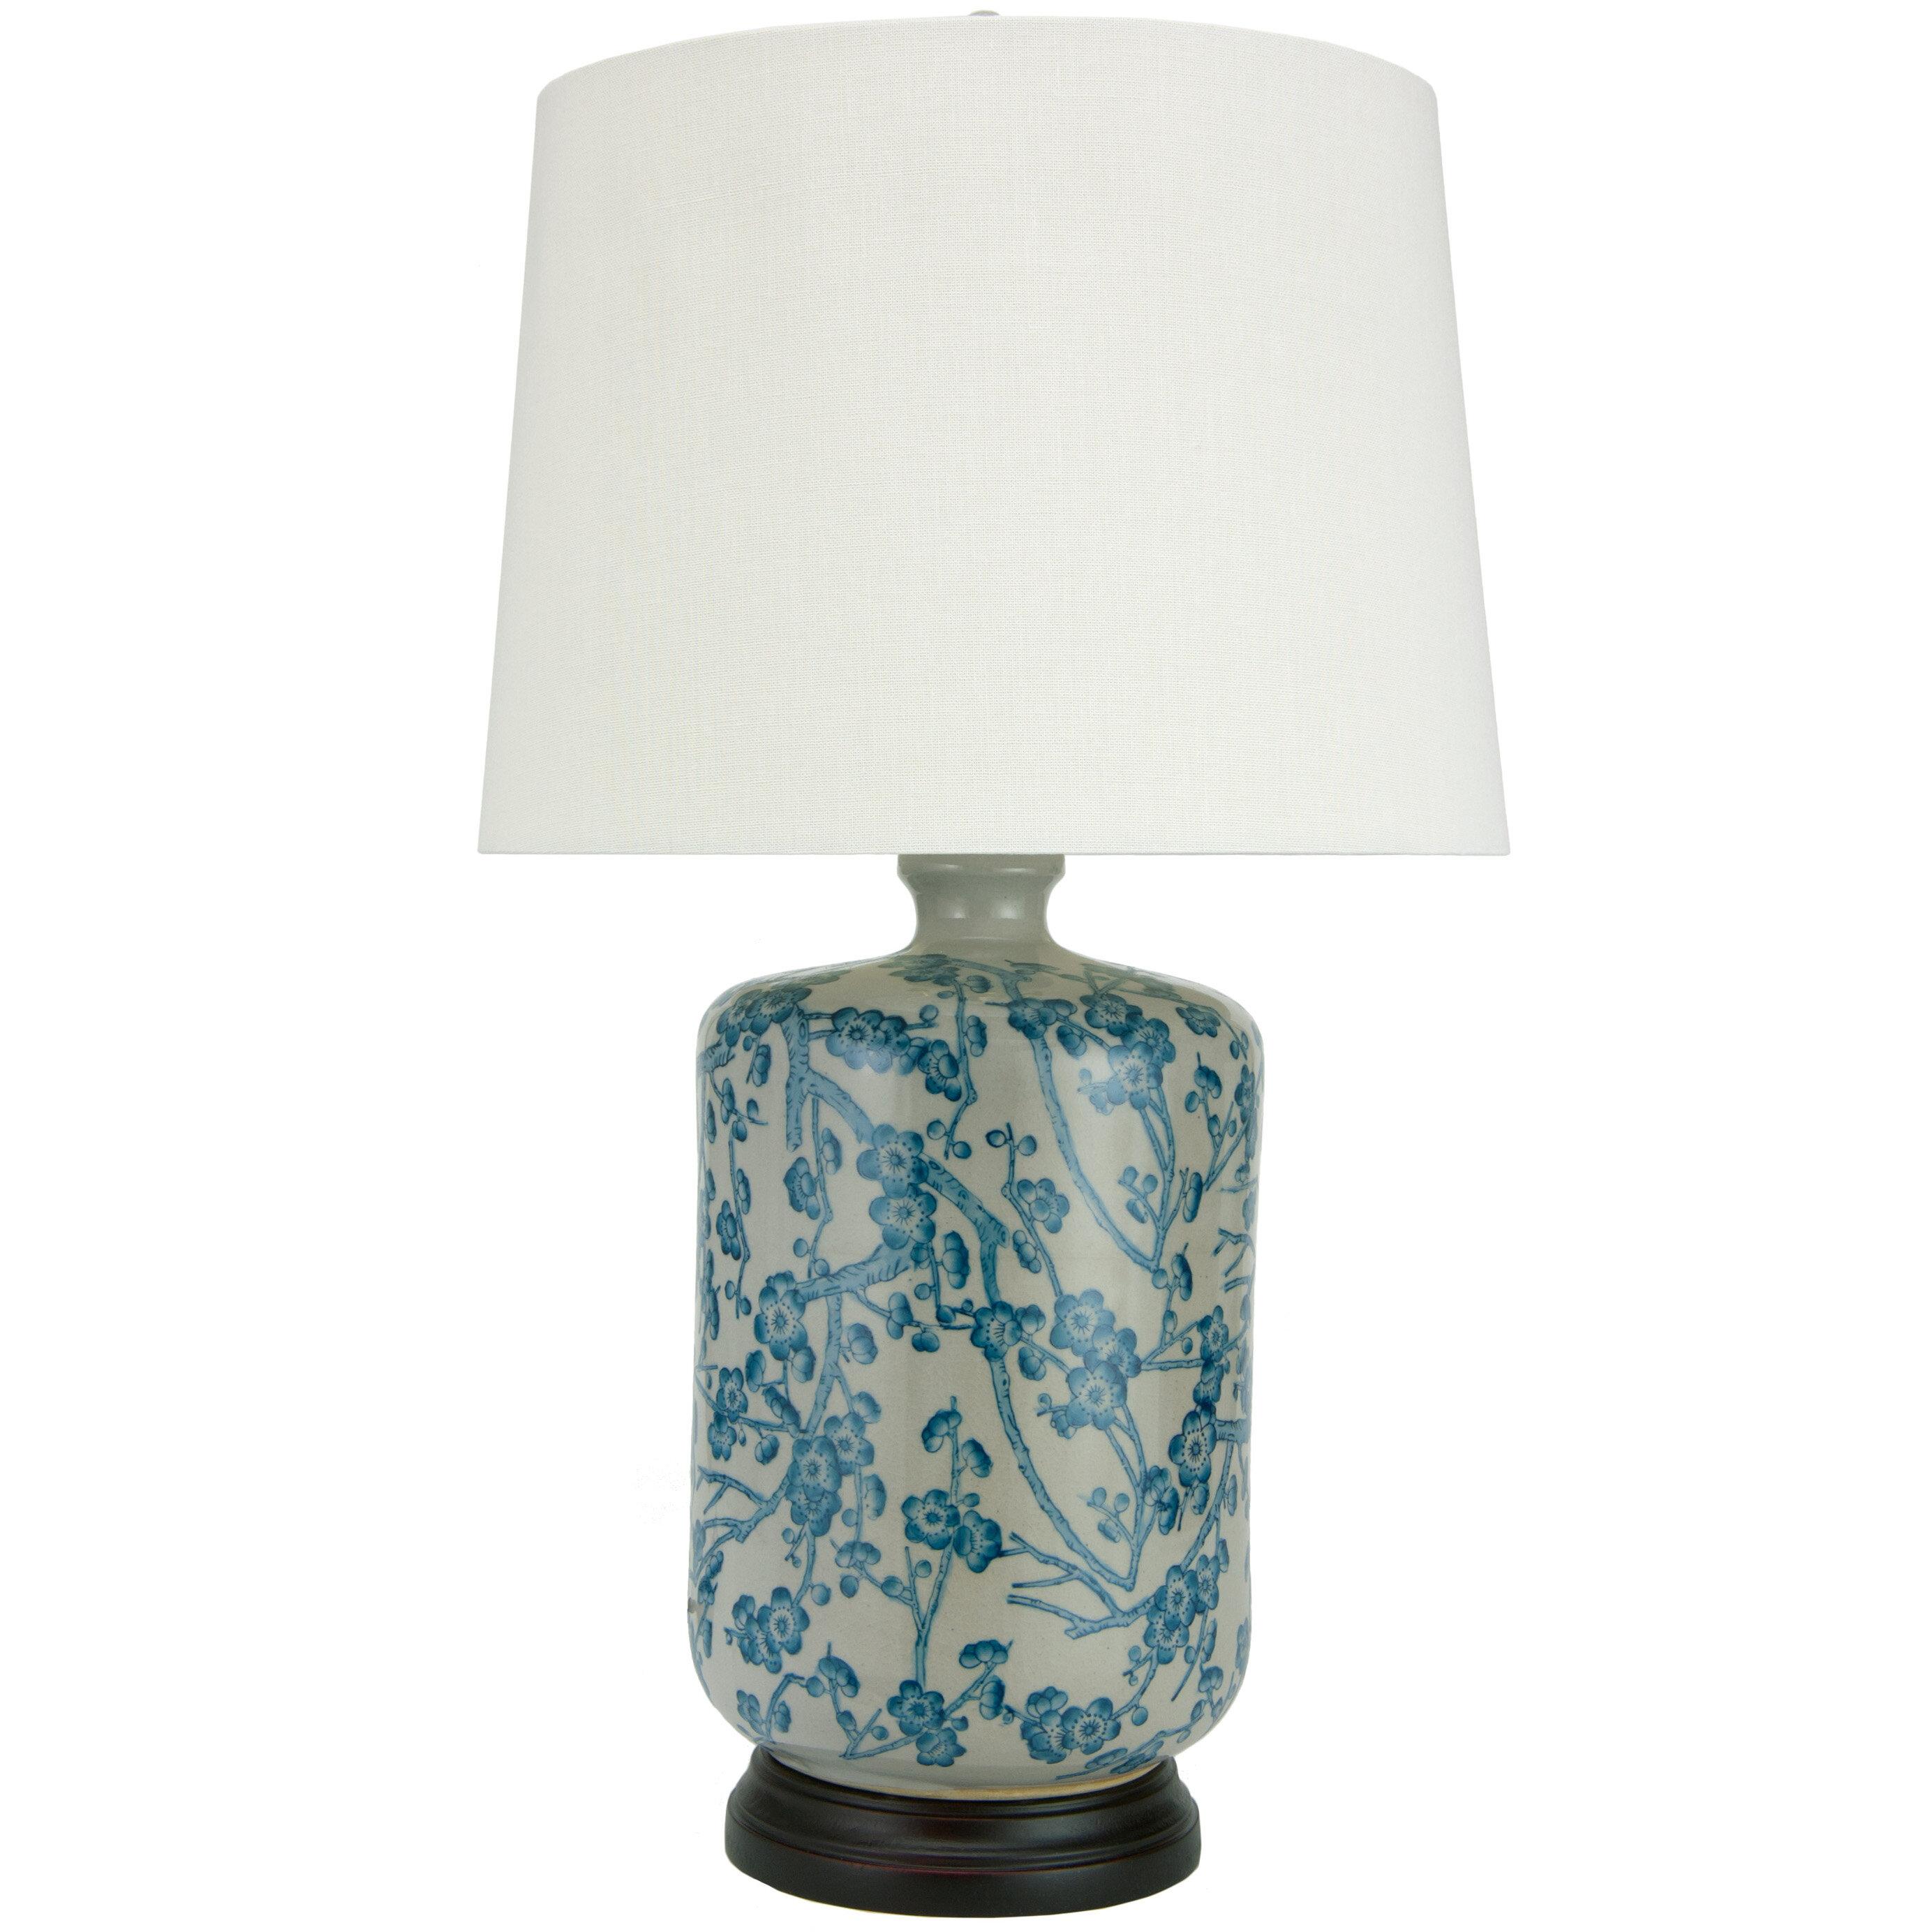 Oriental Furniture Cherry Blossom 25 Table Lamp Reviews Wayfair